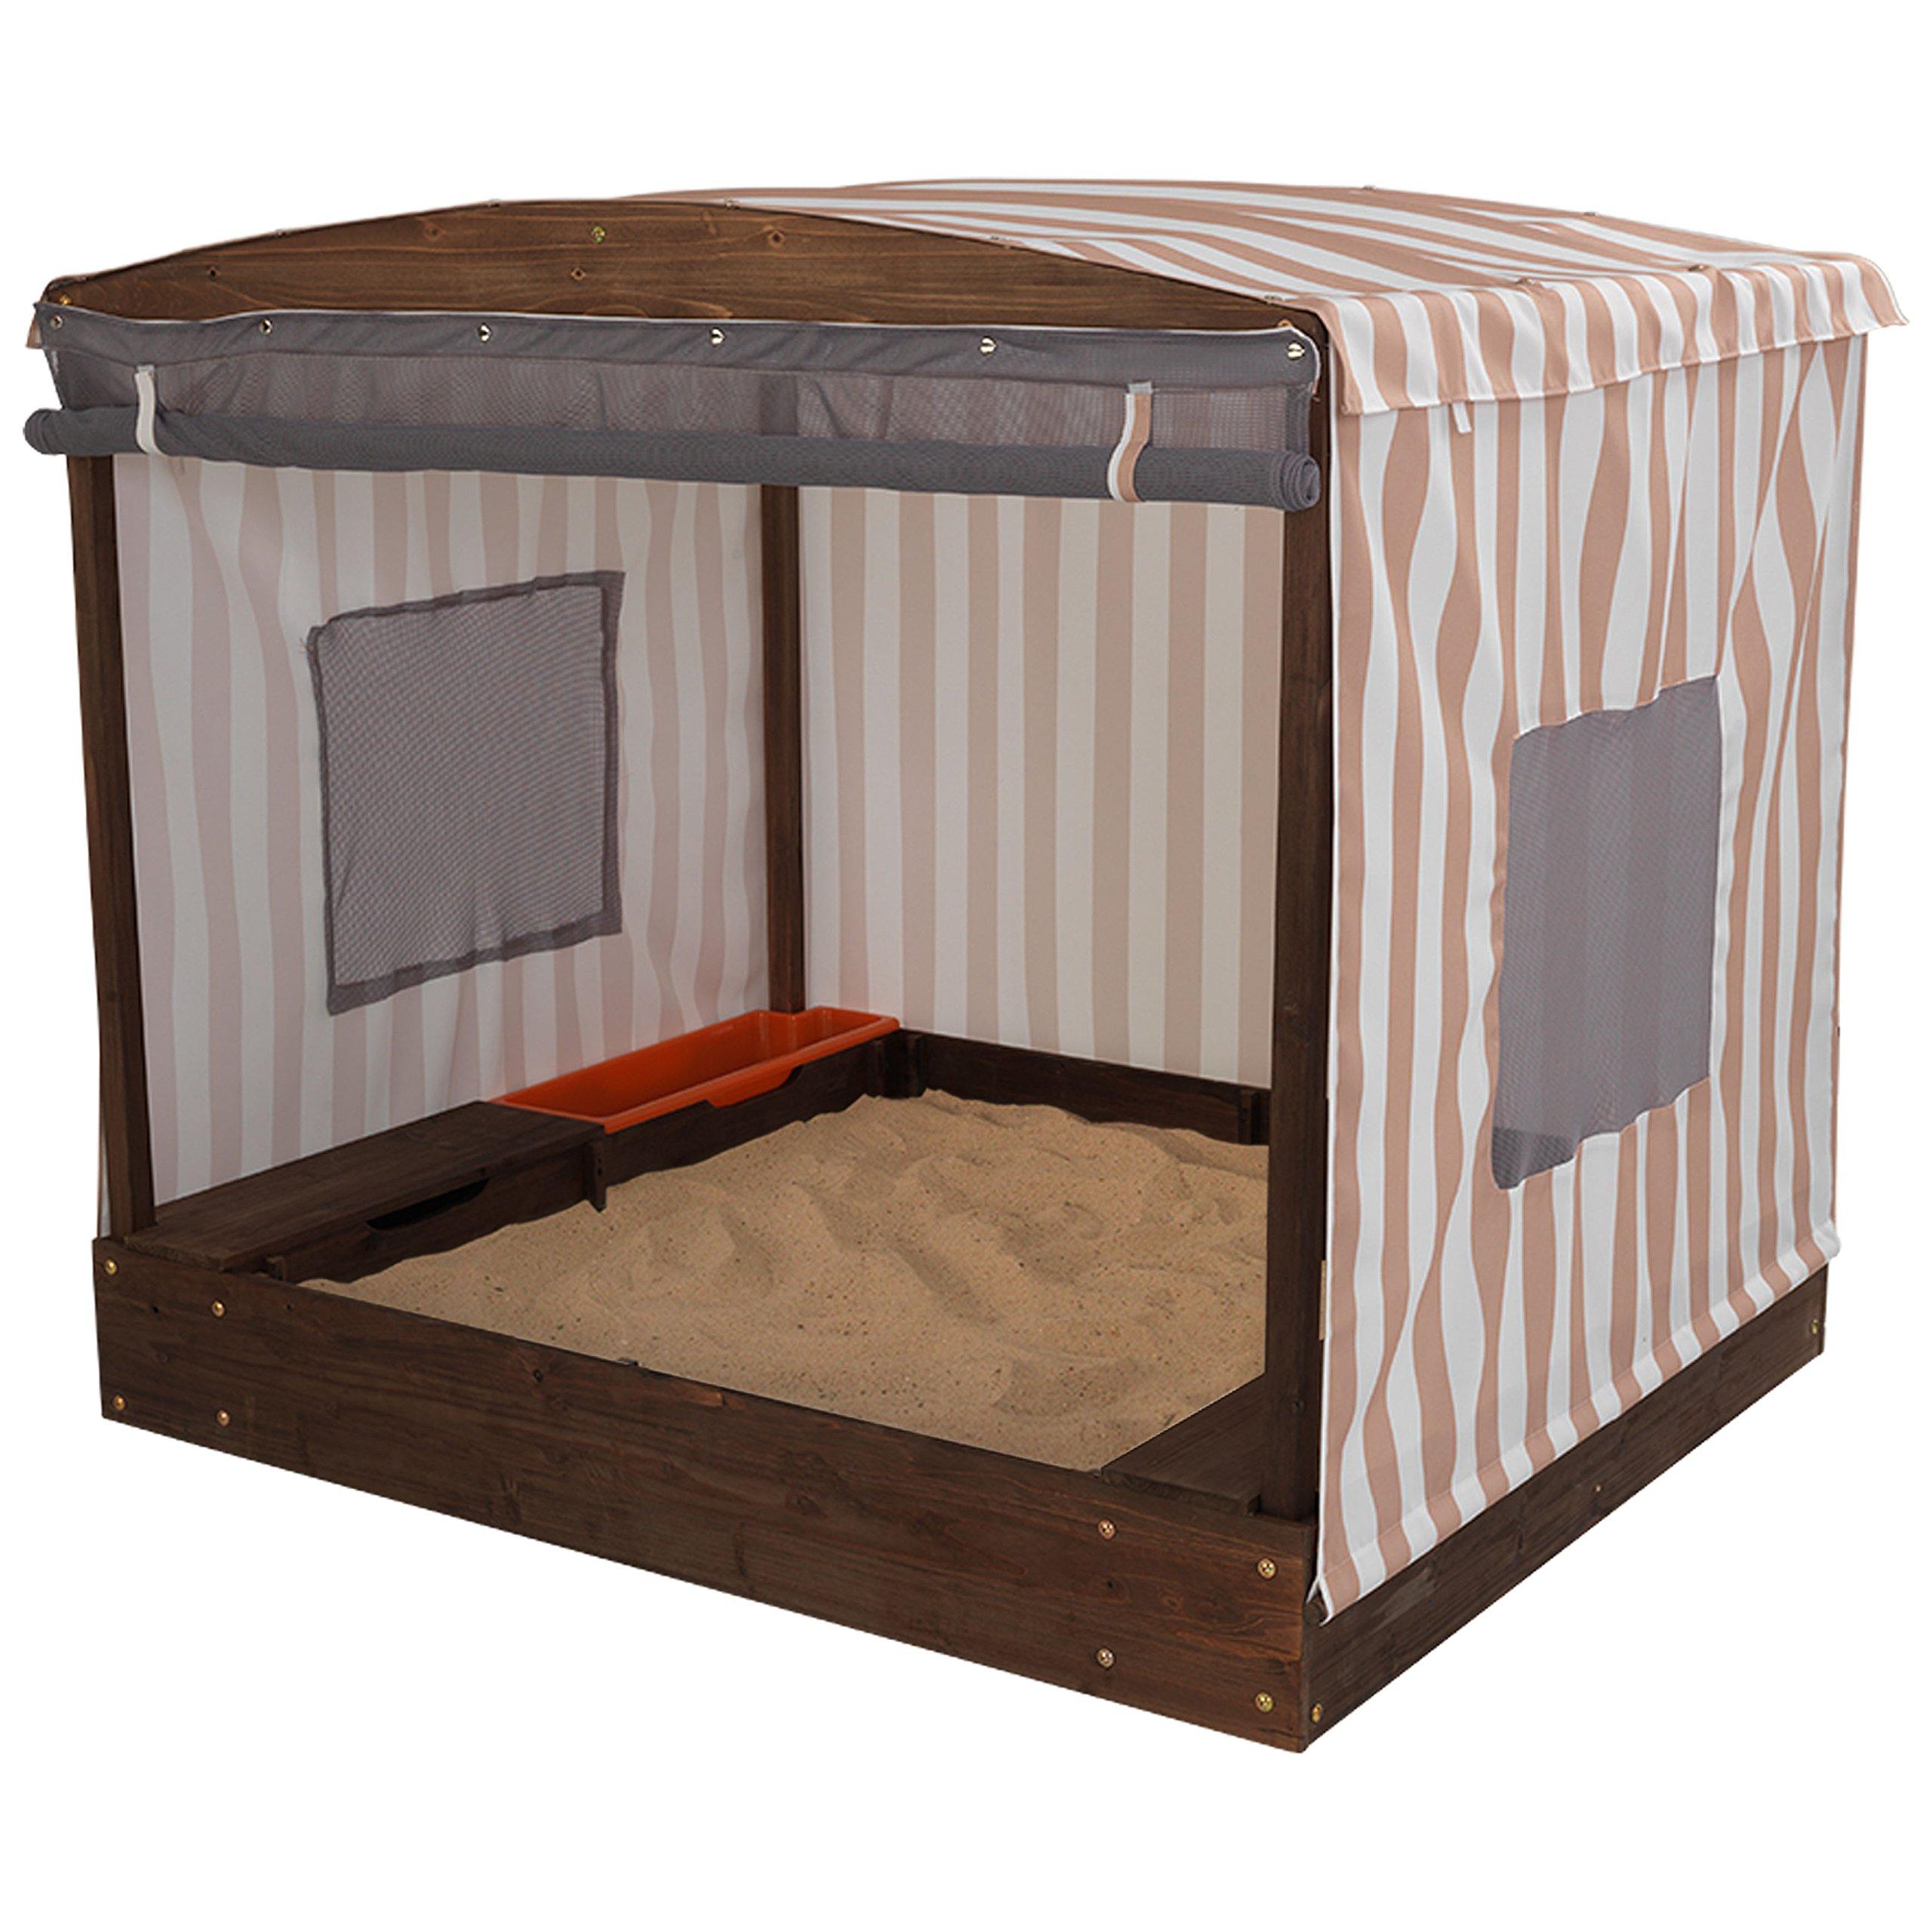 KidKraft 00 Cabana Sandbox, Oatmeal and White Stripes by KidKraft